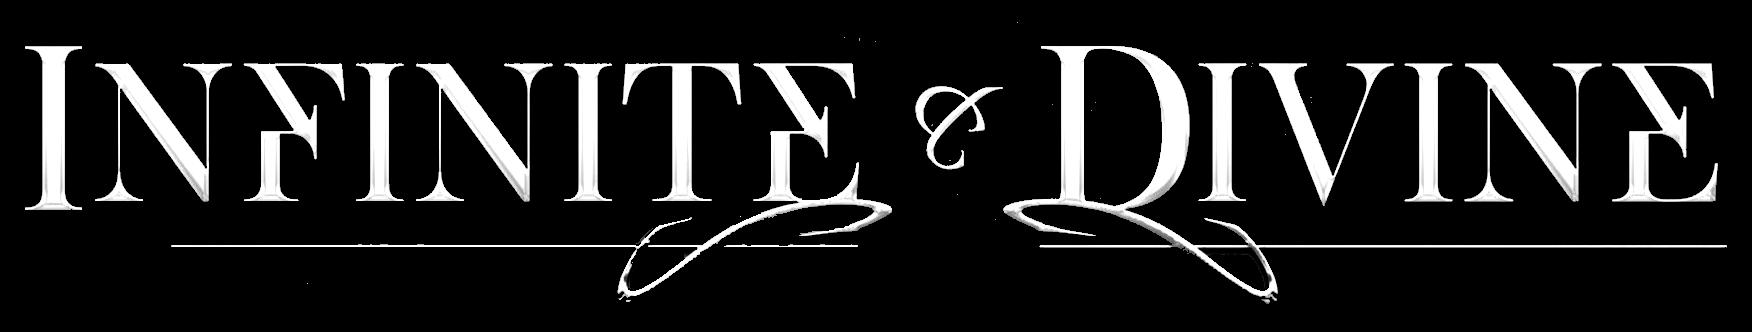 Infinite & Divine - Logo